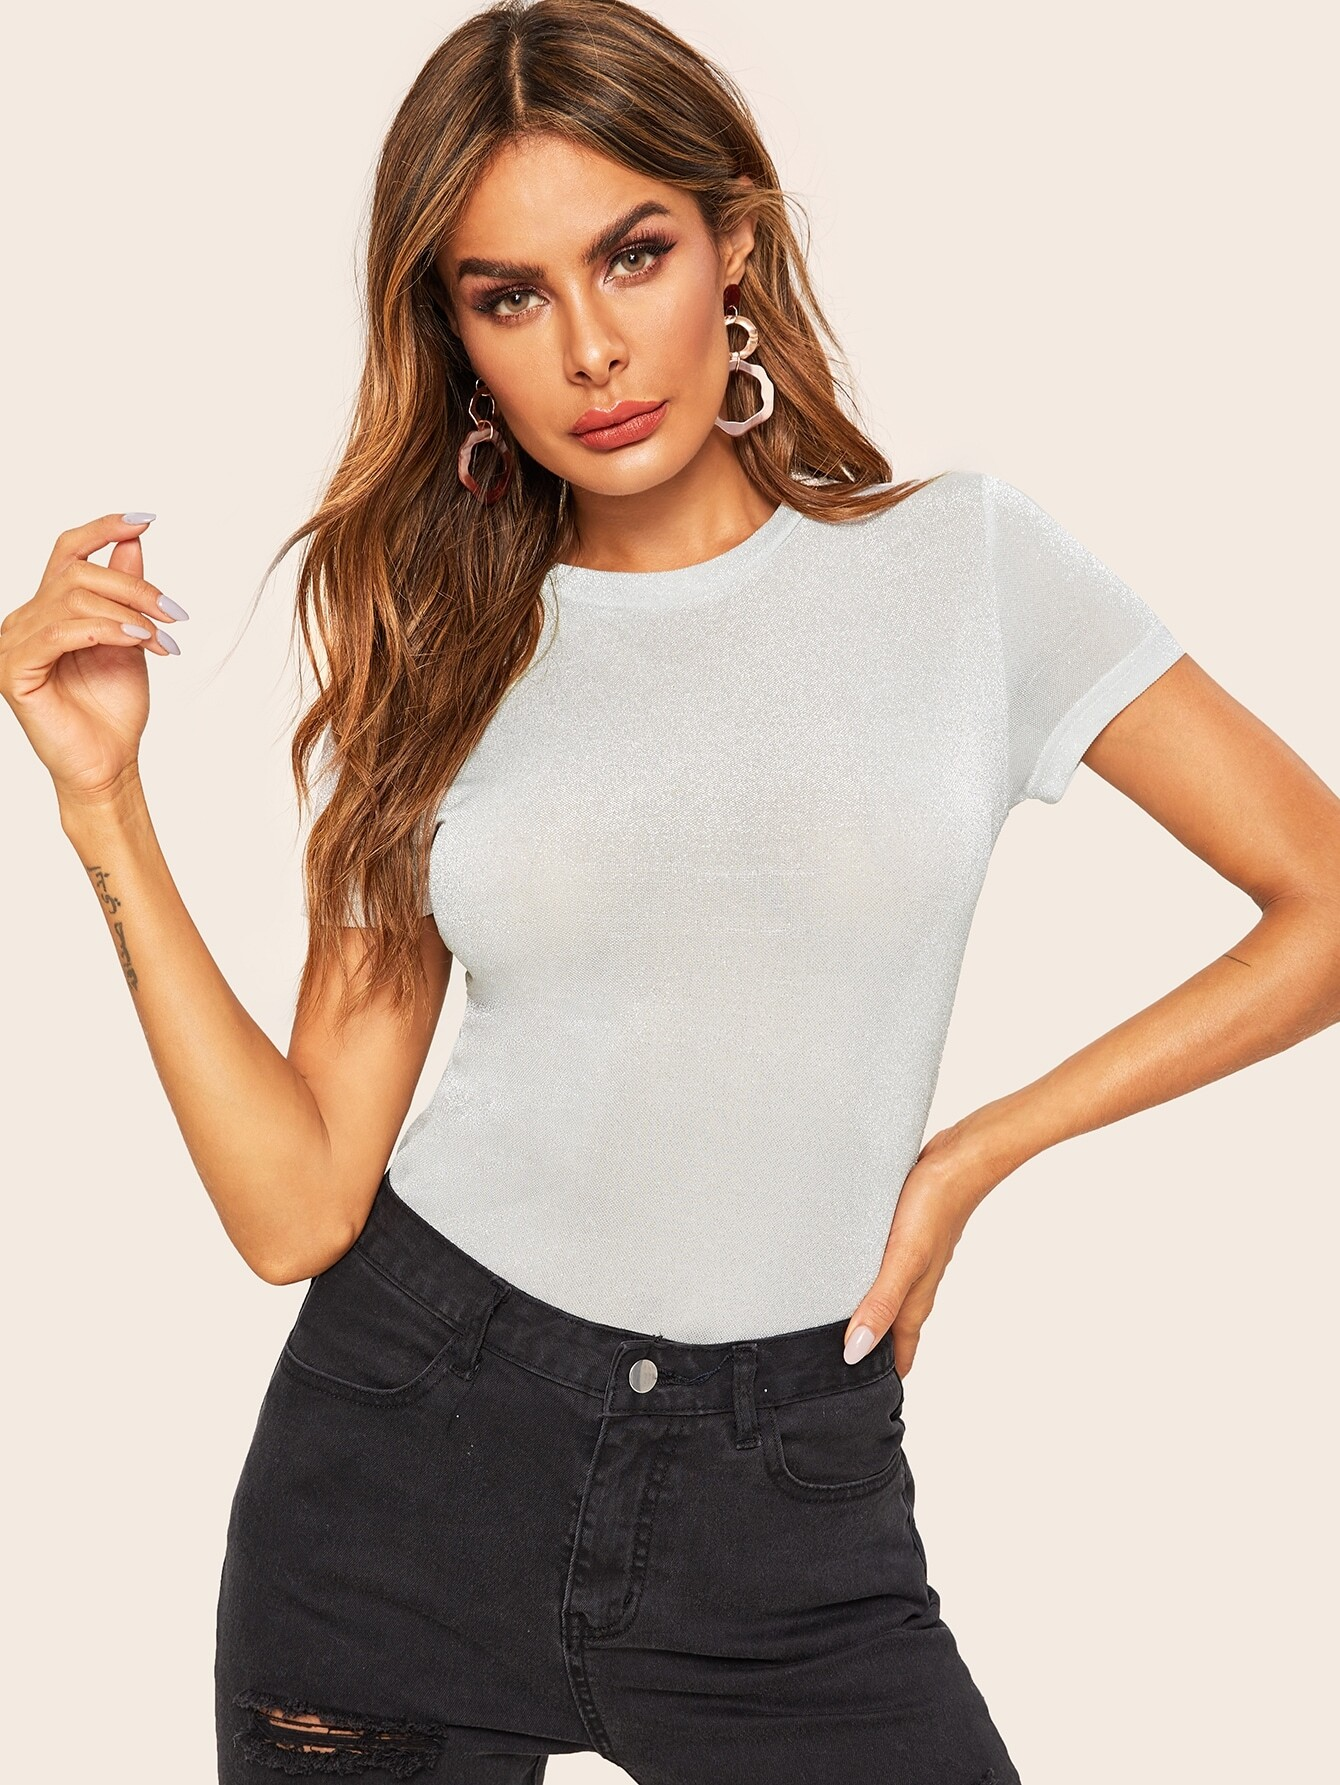 Фото - Блестящая однотонная футболка от SheIn серого цвета